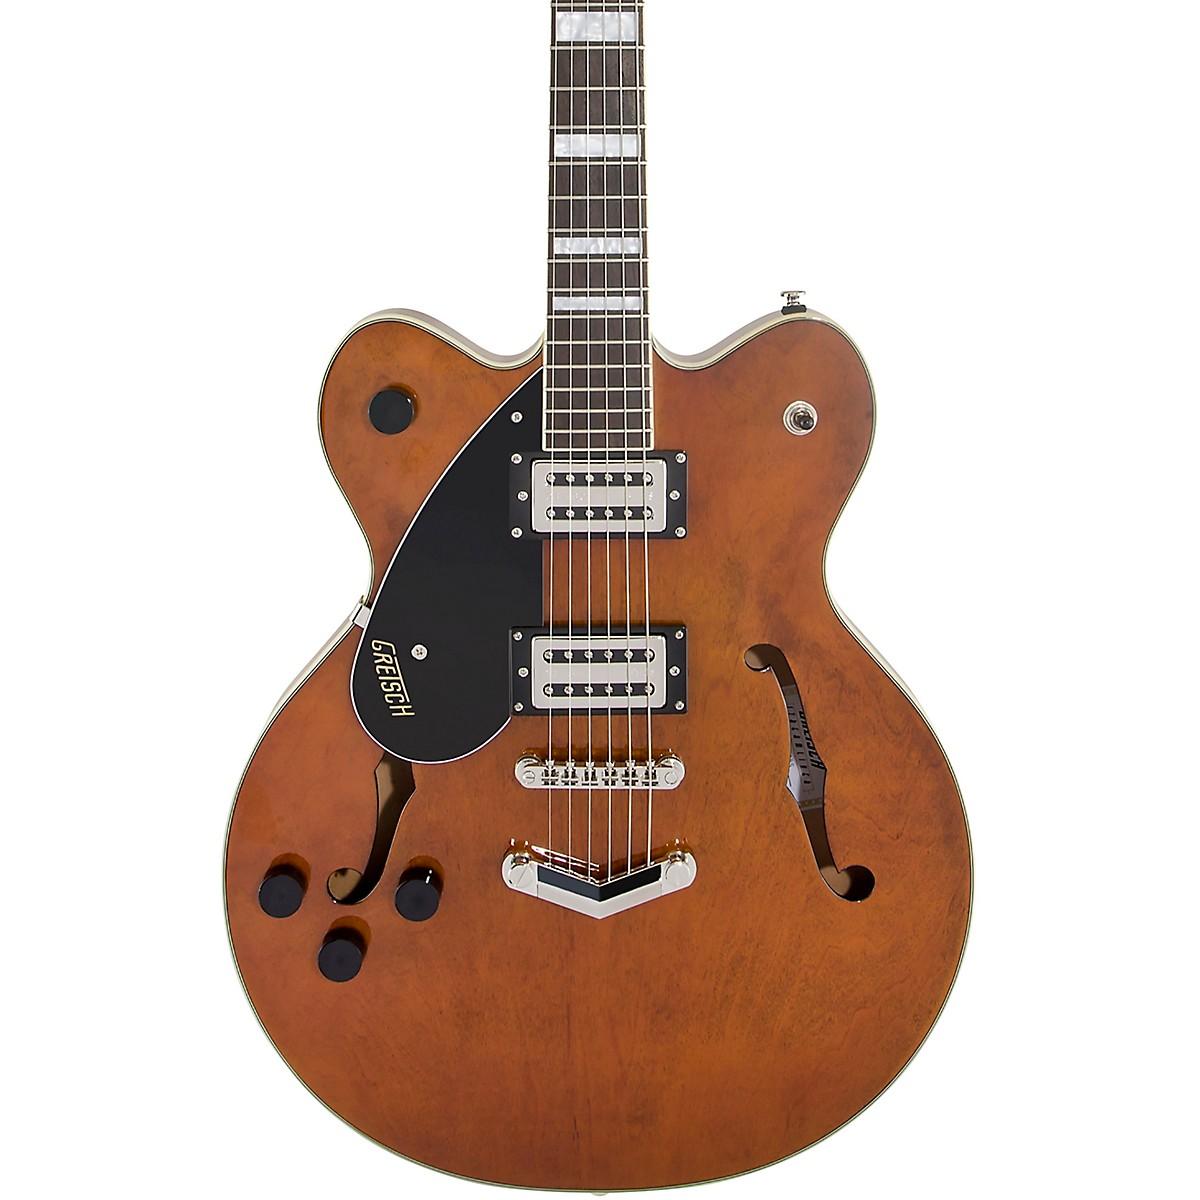 Gretsch Guitars G2622LH Streamliner Center Block with V-Stoptail, Left-Handed Electric Guitar